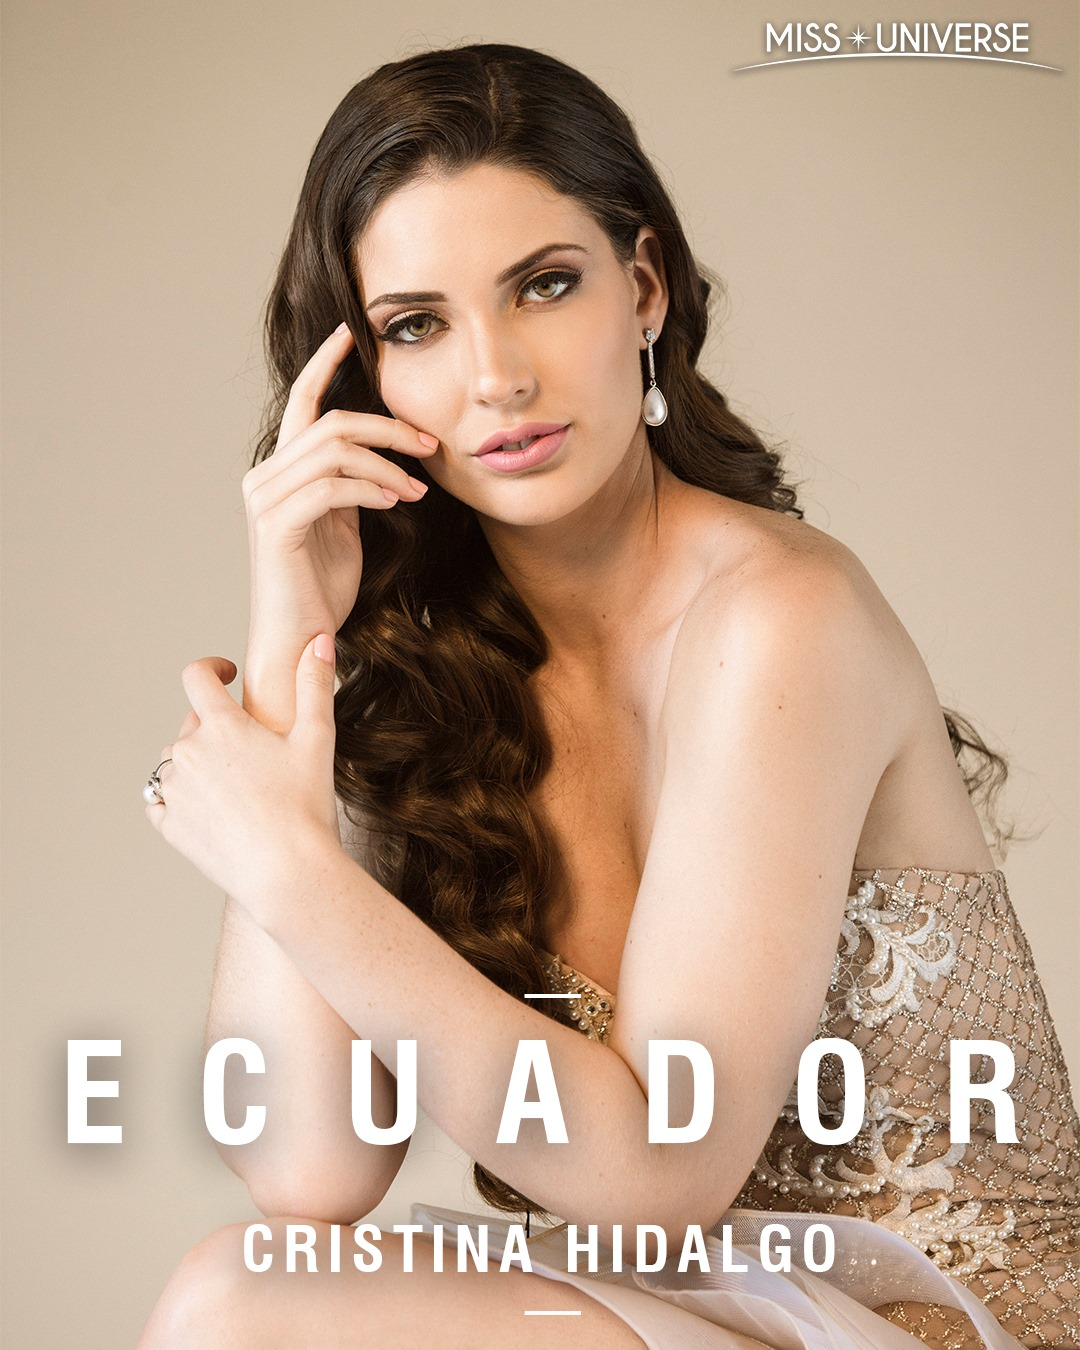 Cristina Hidalgo Berry (ECUADOR 2019) - Page 2 16